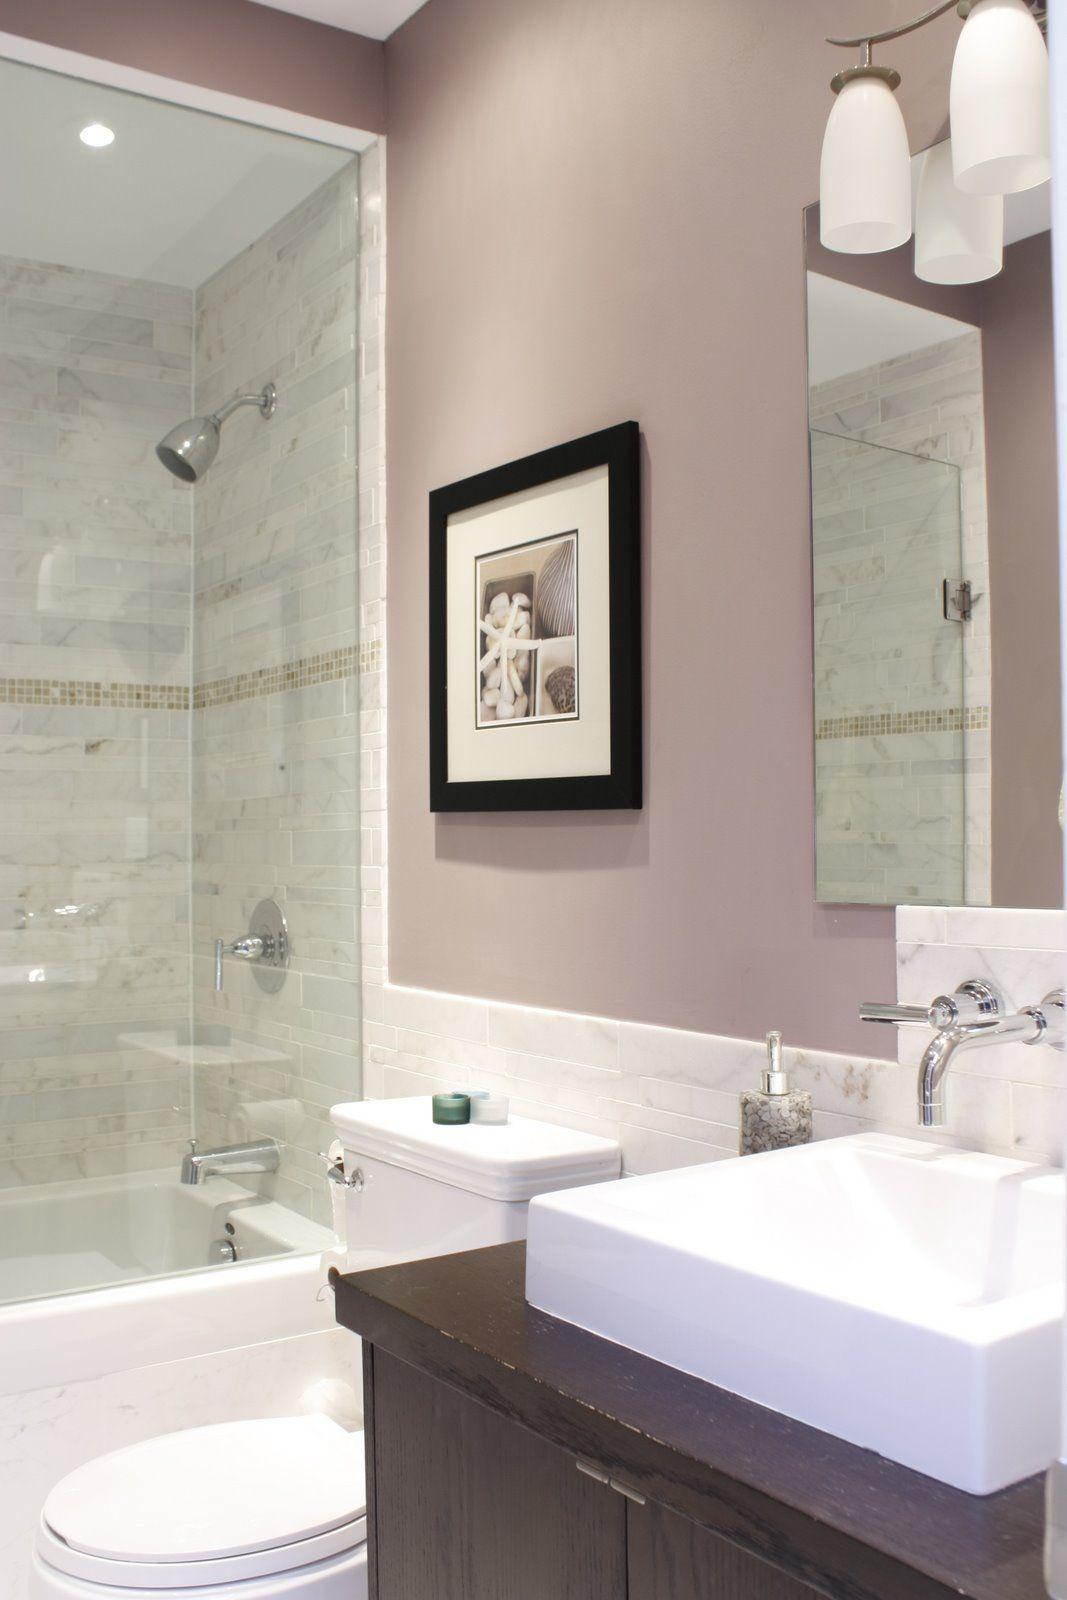 Hall bathroom decorating ideas specs price release for Hallway bathroom ideas